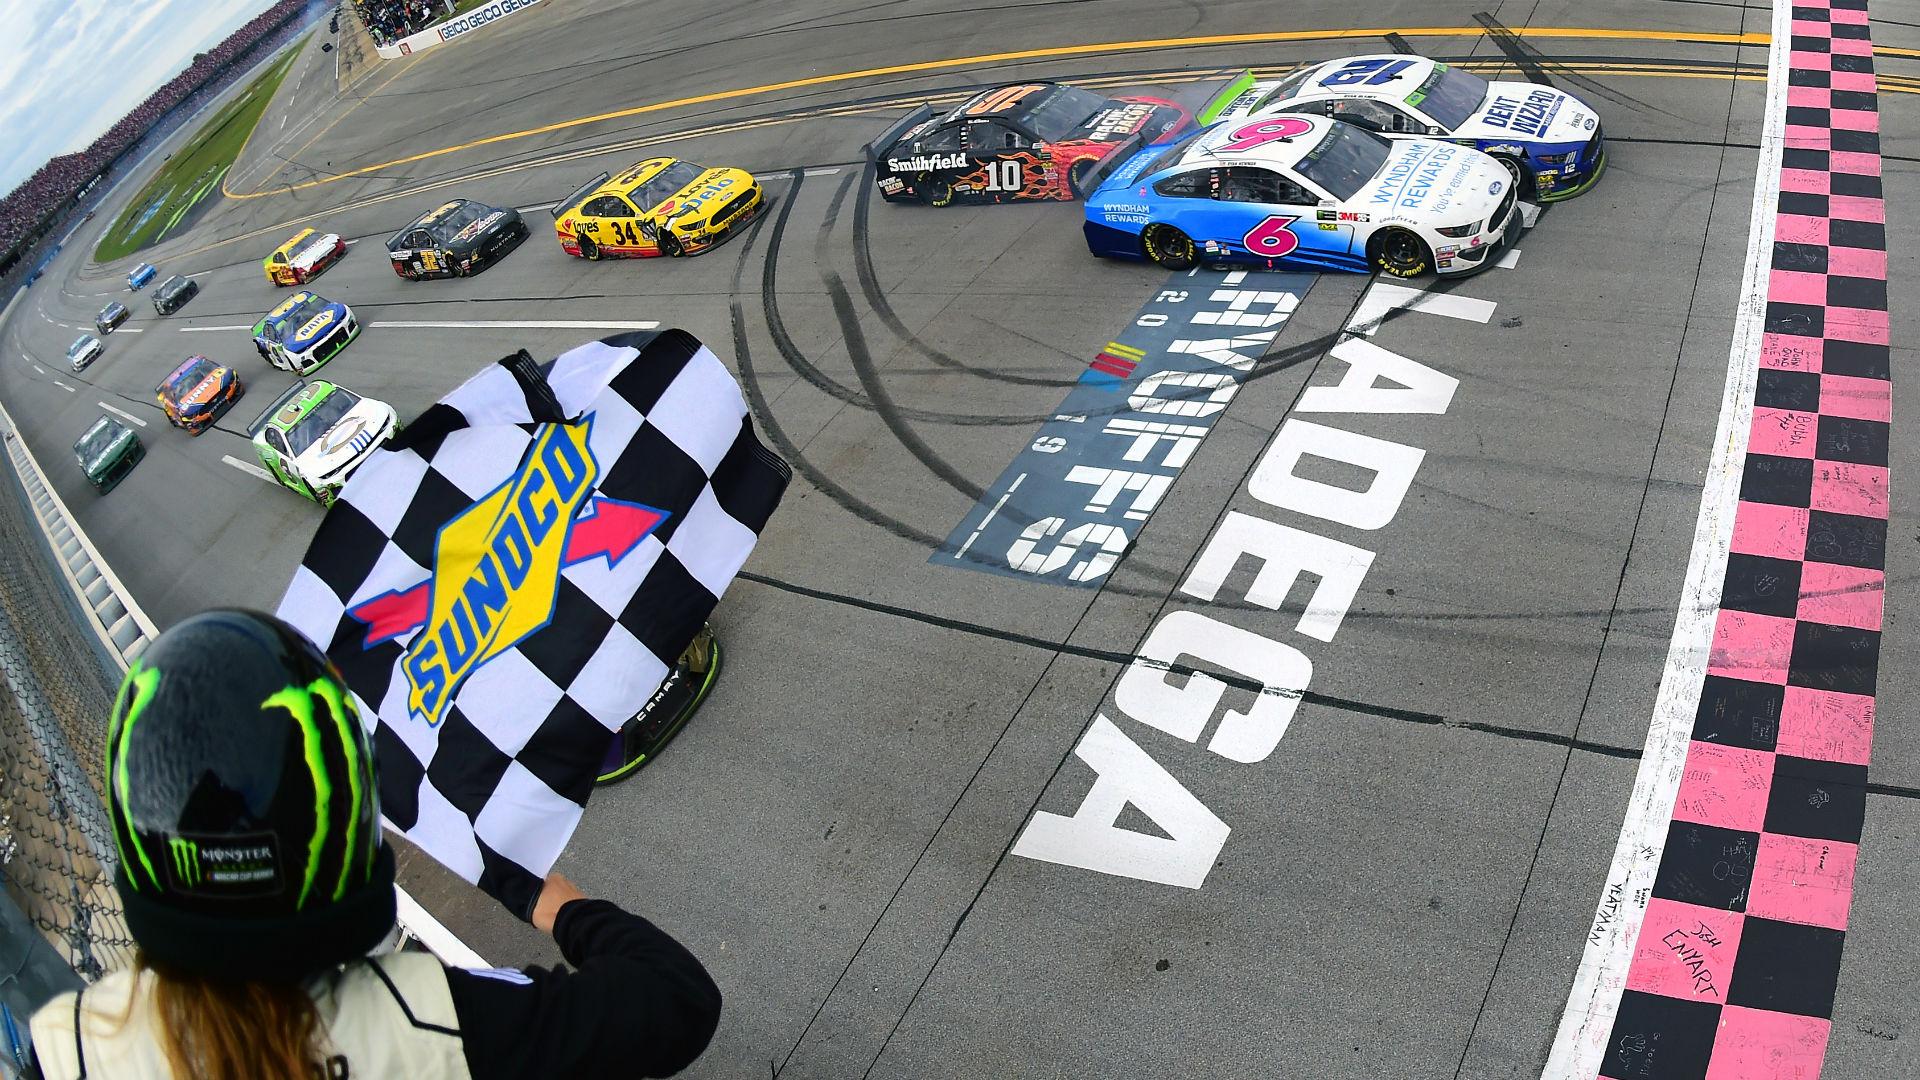 NASCAR at Talladega results: Ryan Blaney wins after massive crash sets up photo finish